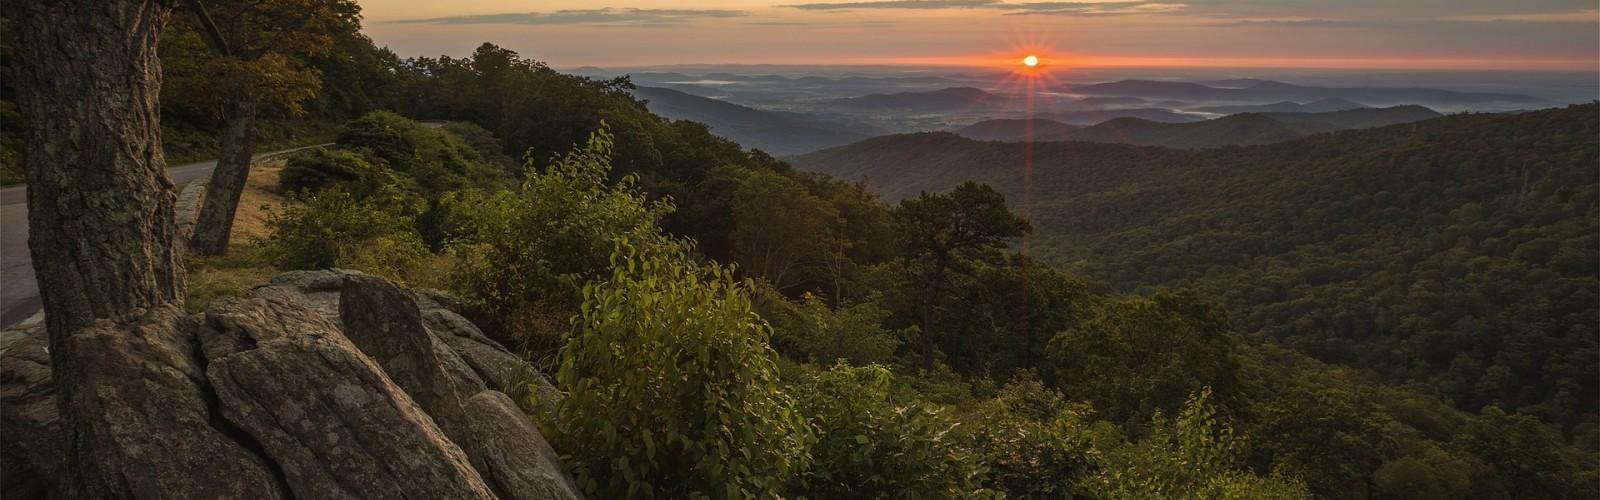 Shenandoah National Park Fee-Free Day